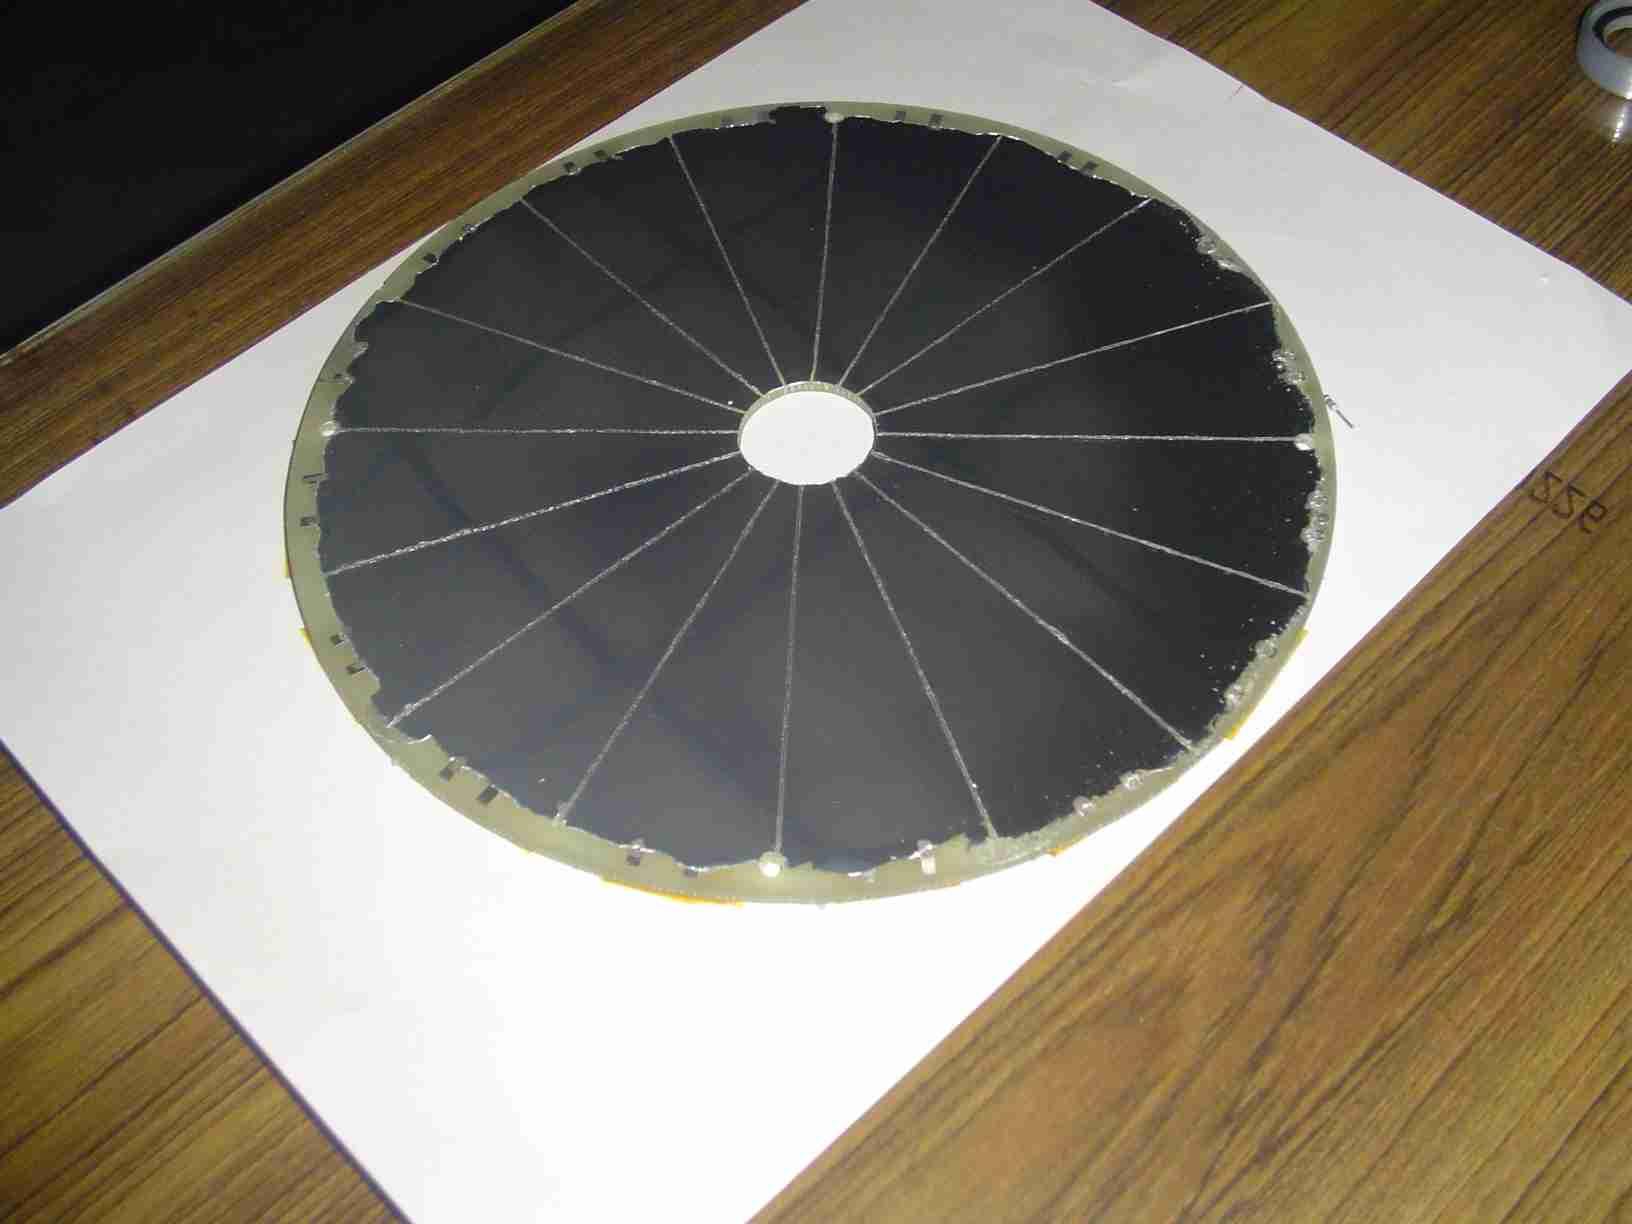 Annular PPAC segmented electrode